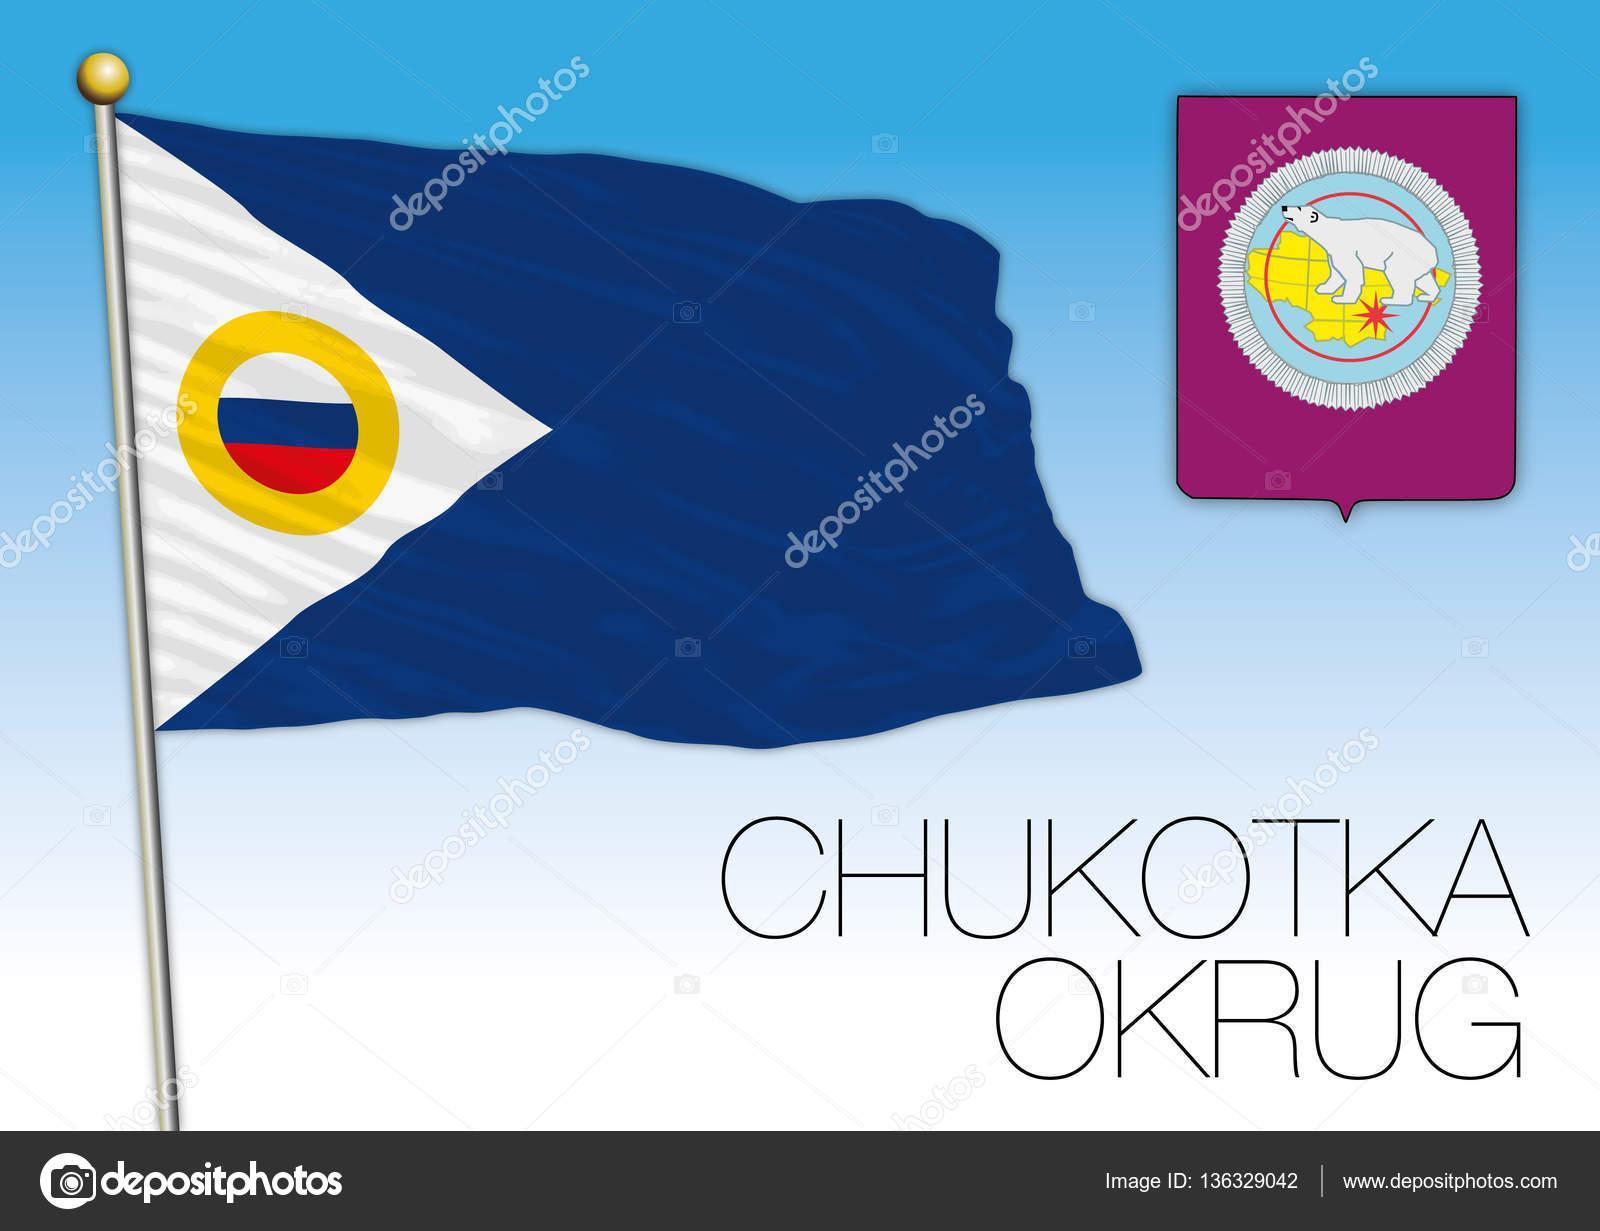 Chukotka Autonomous Okrug Flag Russian Federation Russia Stock